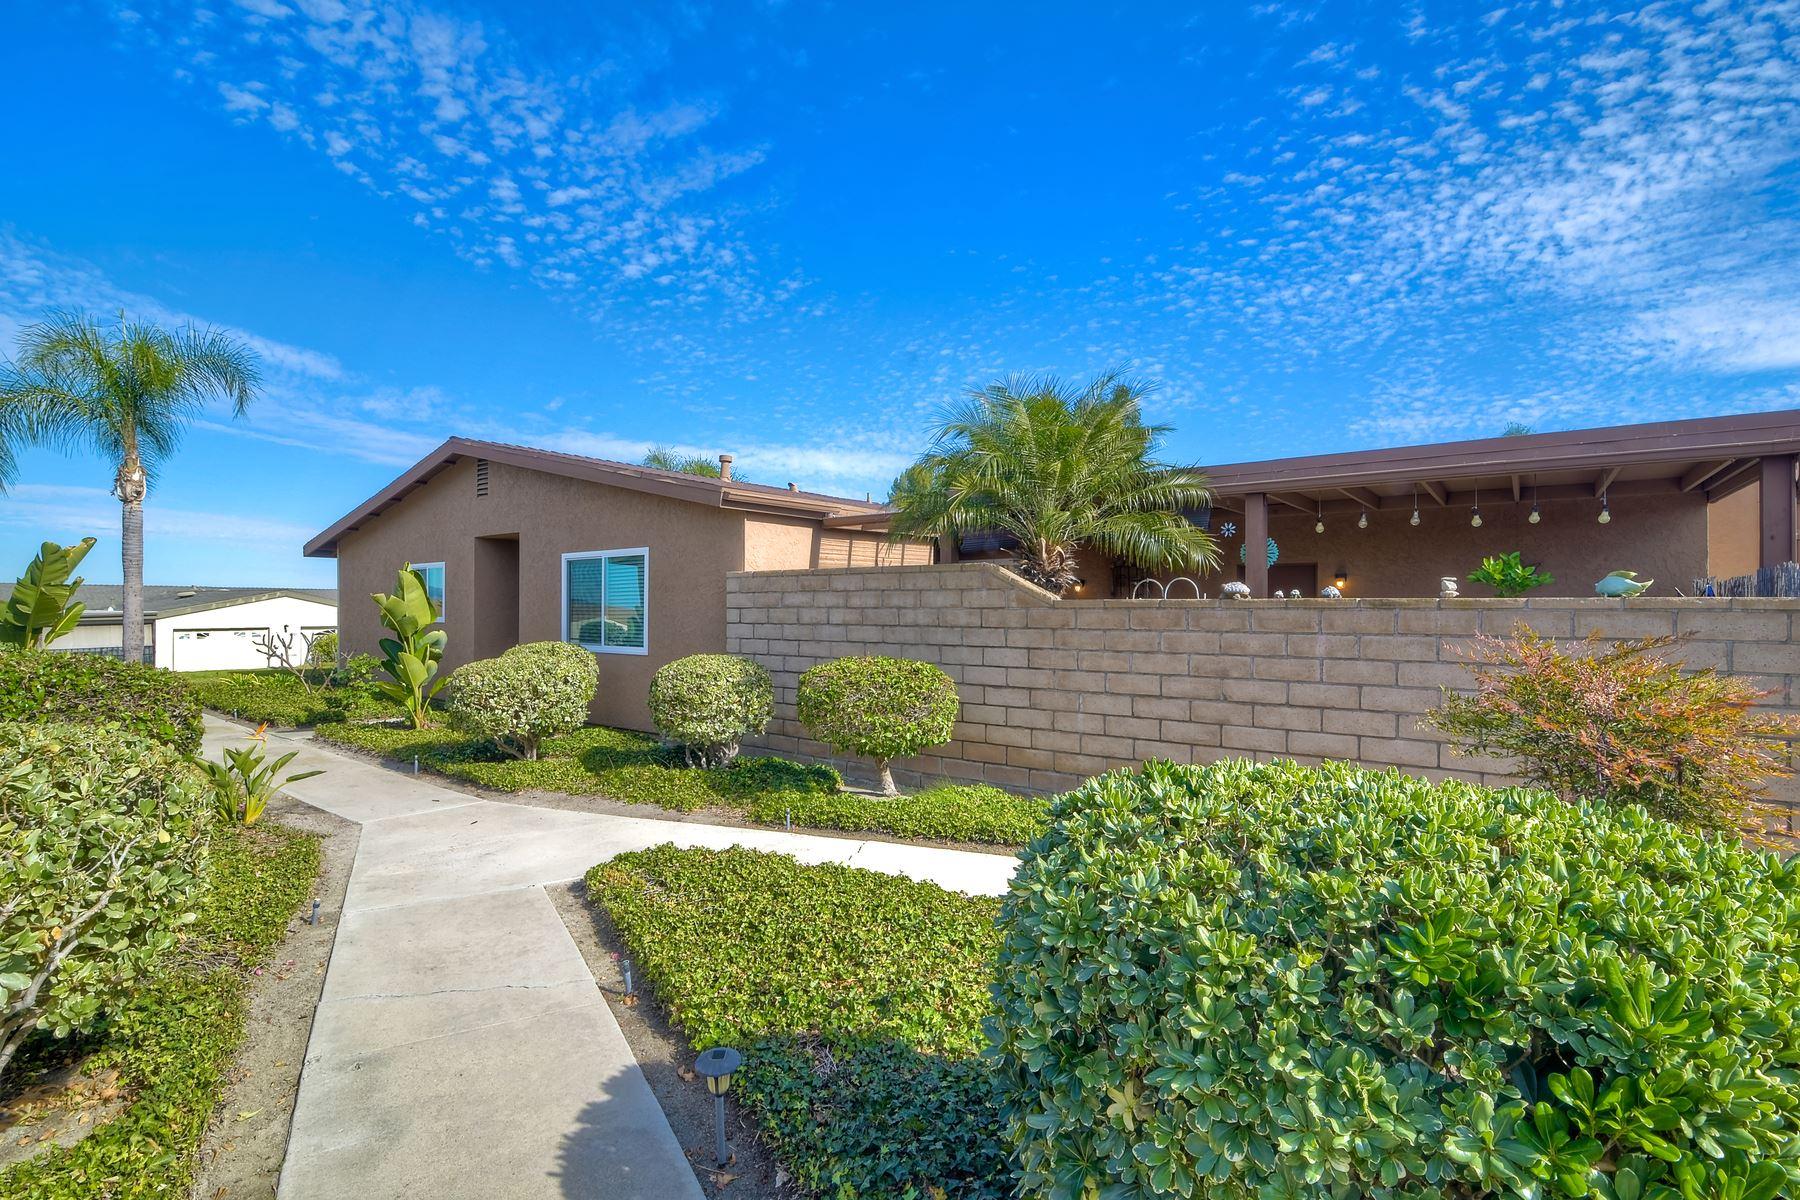 4491 Ibis Way, Oceanside, CA 92057